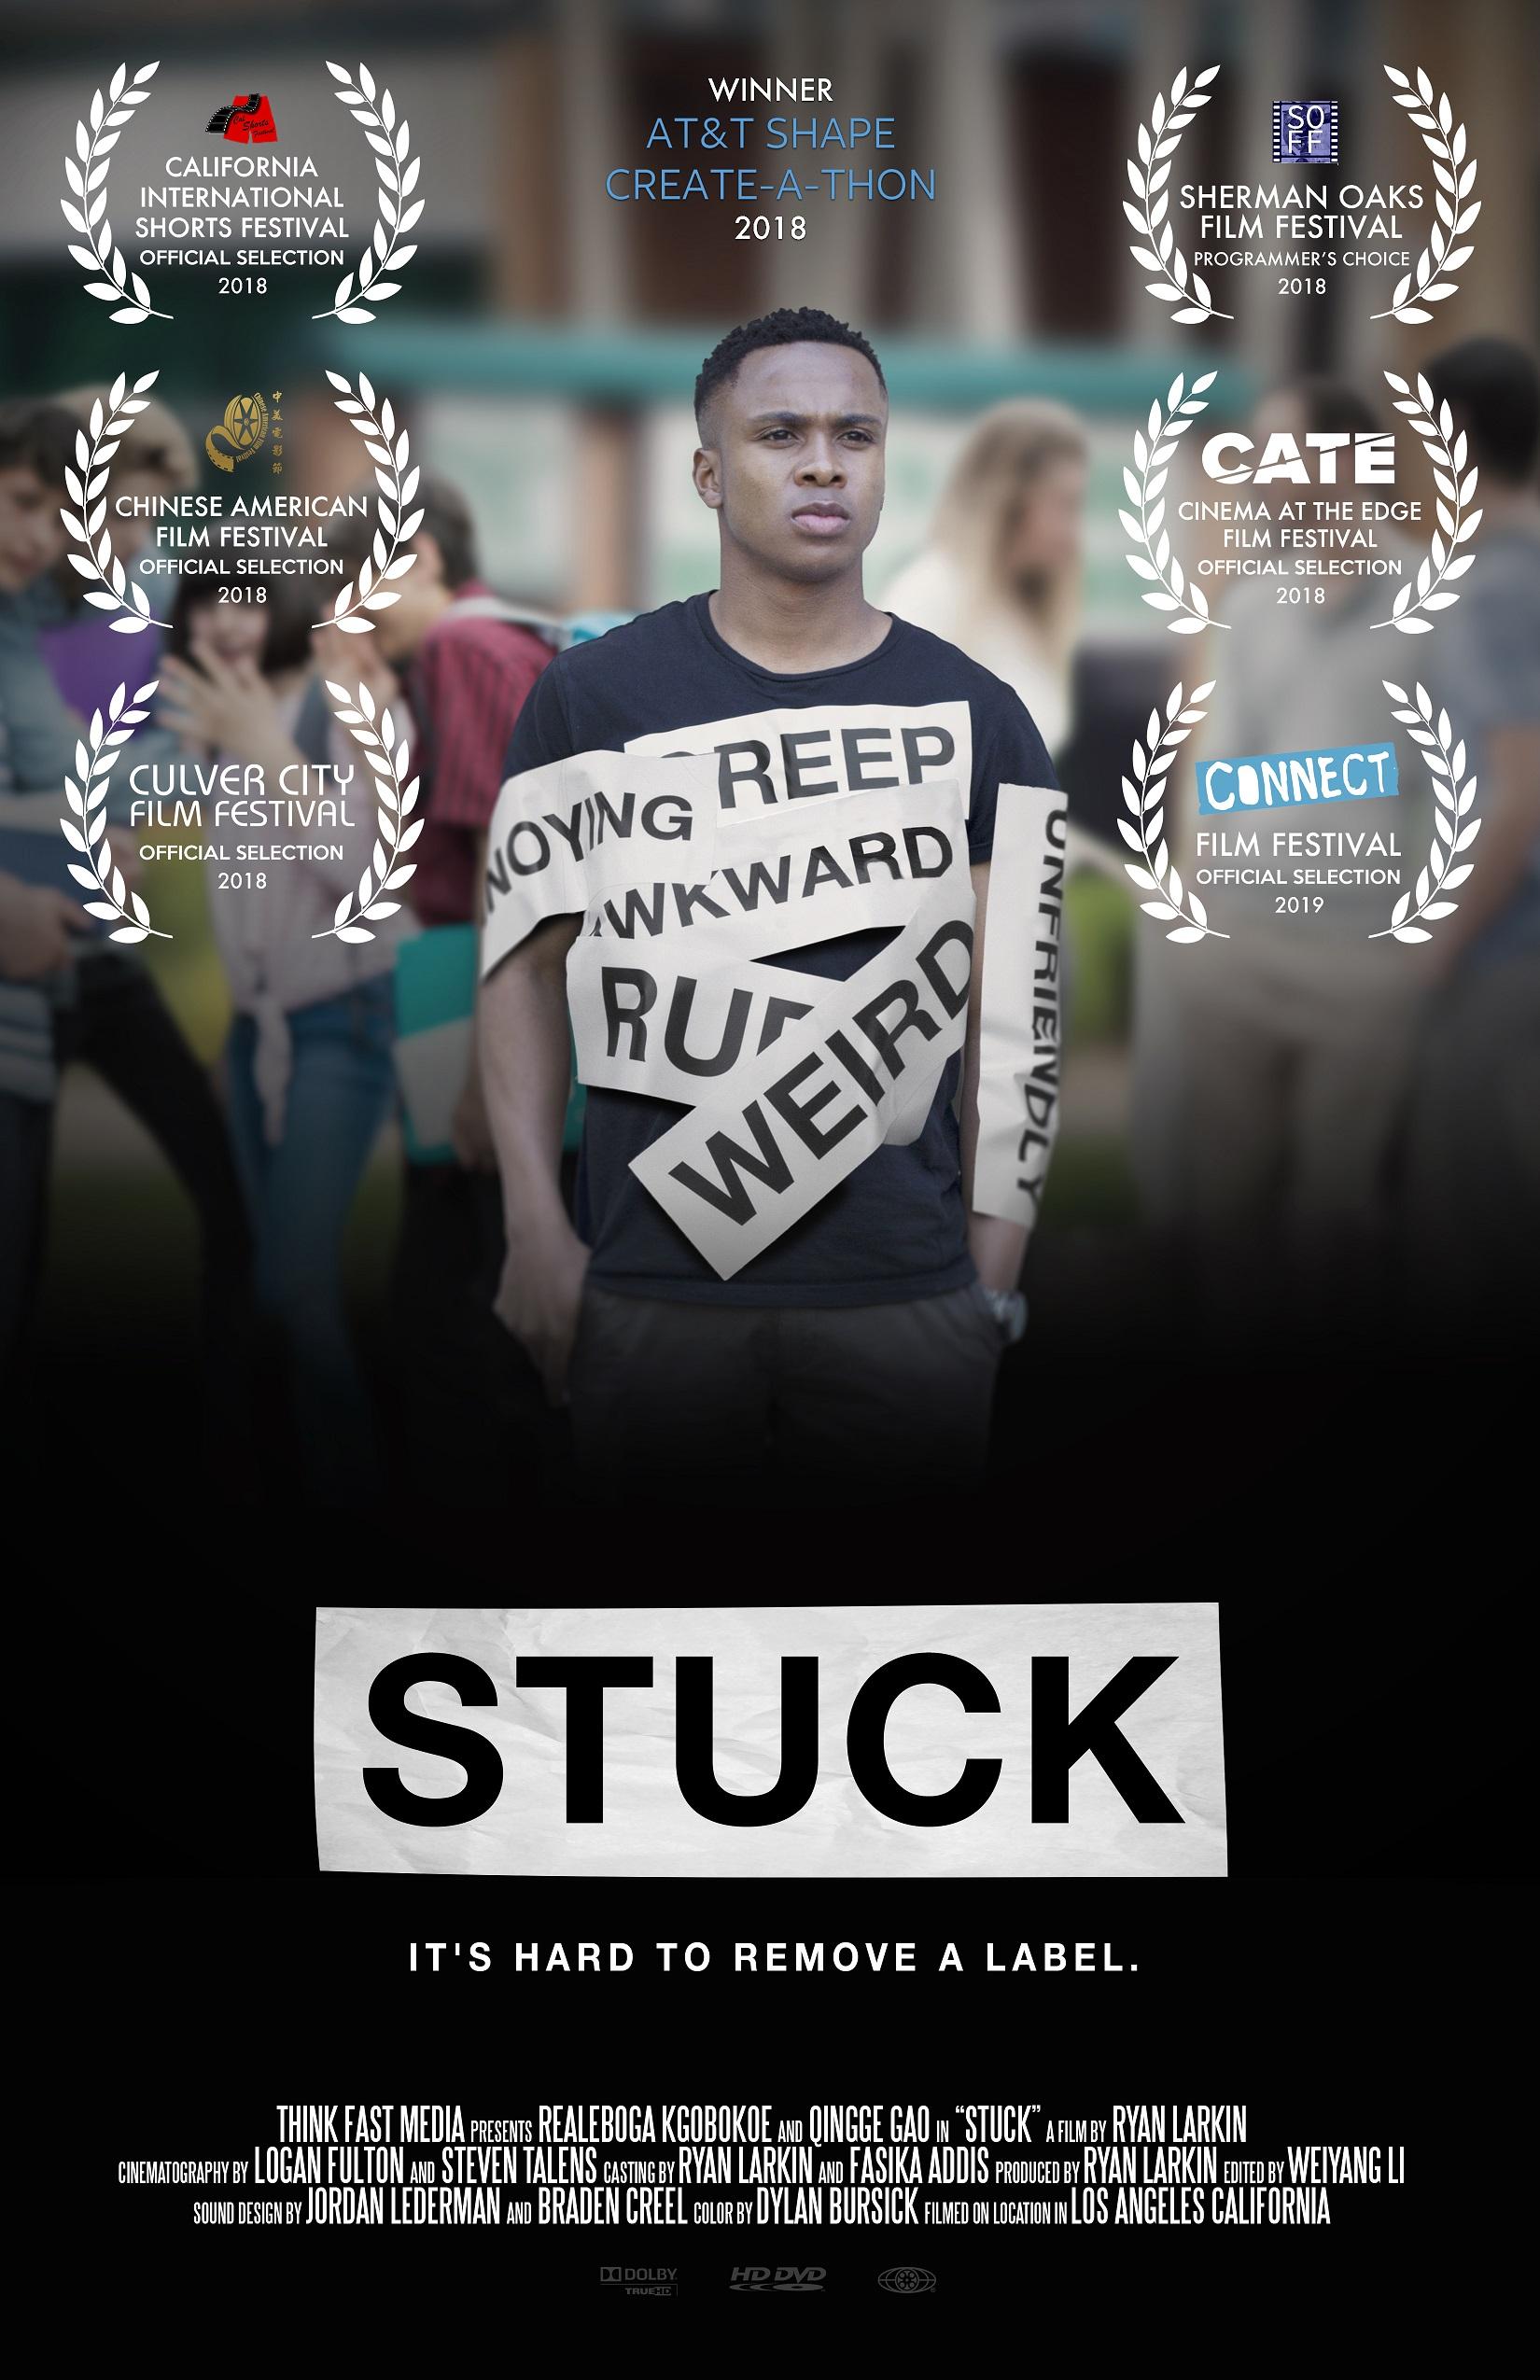 Stuck poster - Photo: Keith Battista